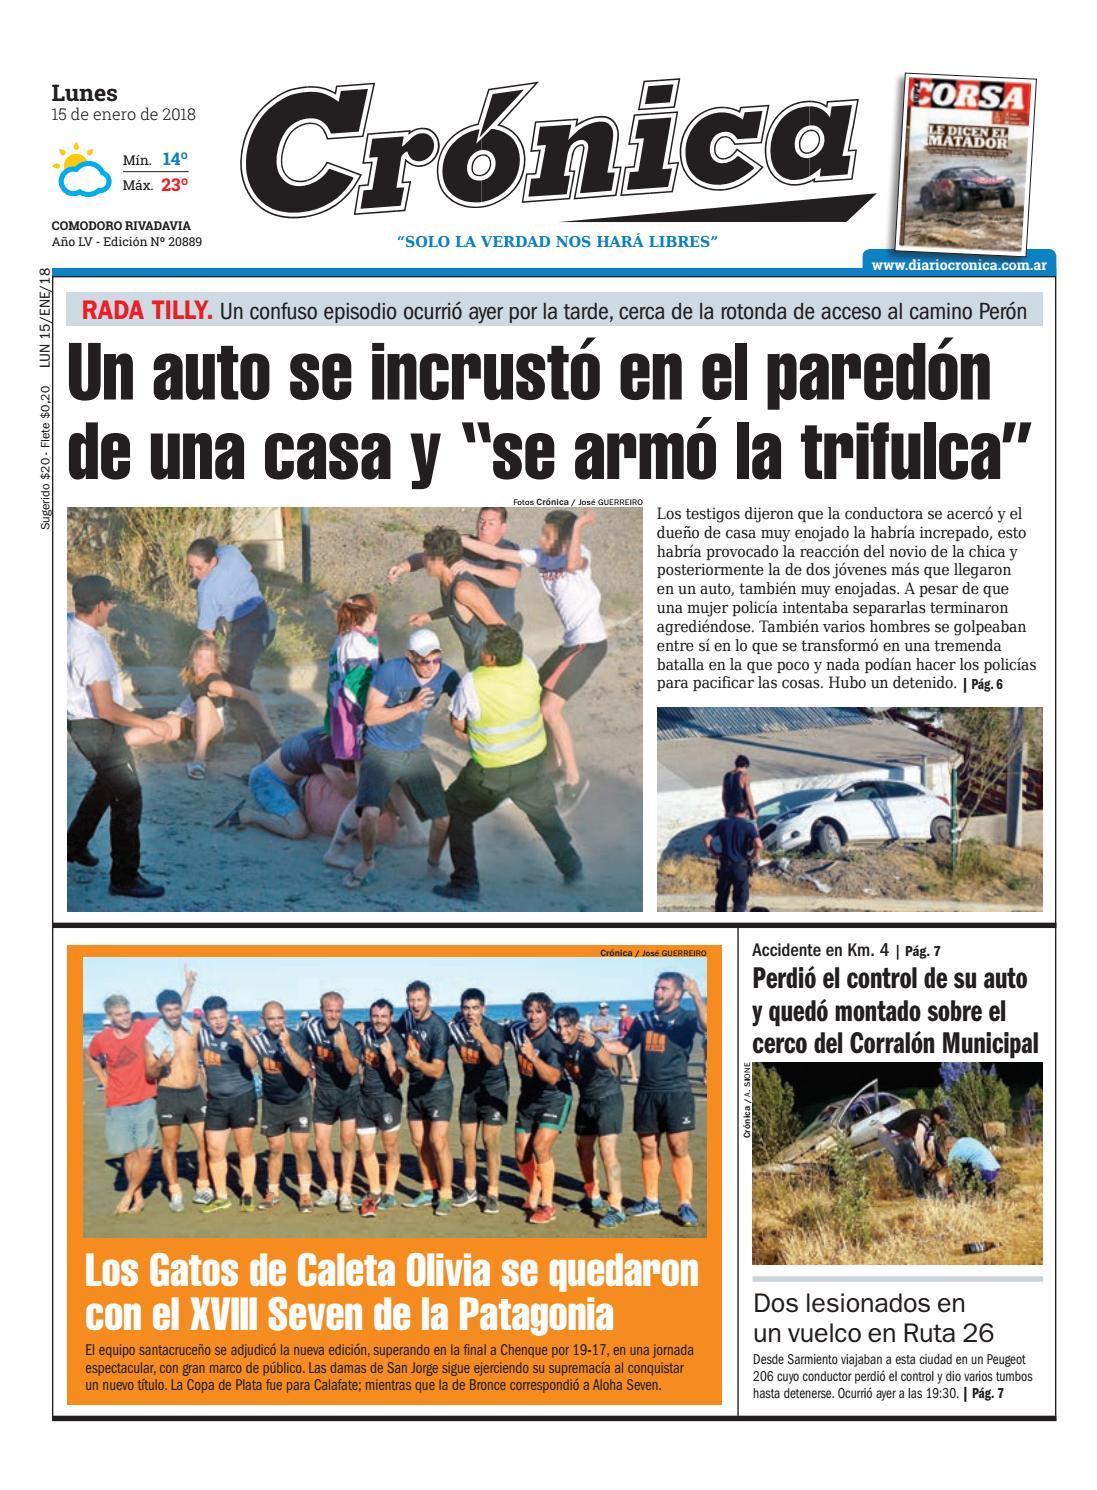 6c217b9df3feb5a3e2ef19051346dcc3 by Diario Crónica - issuu